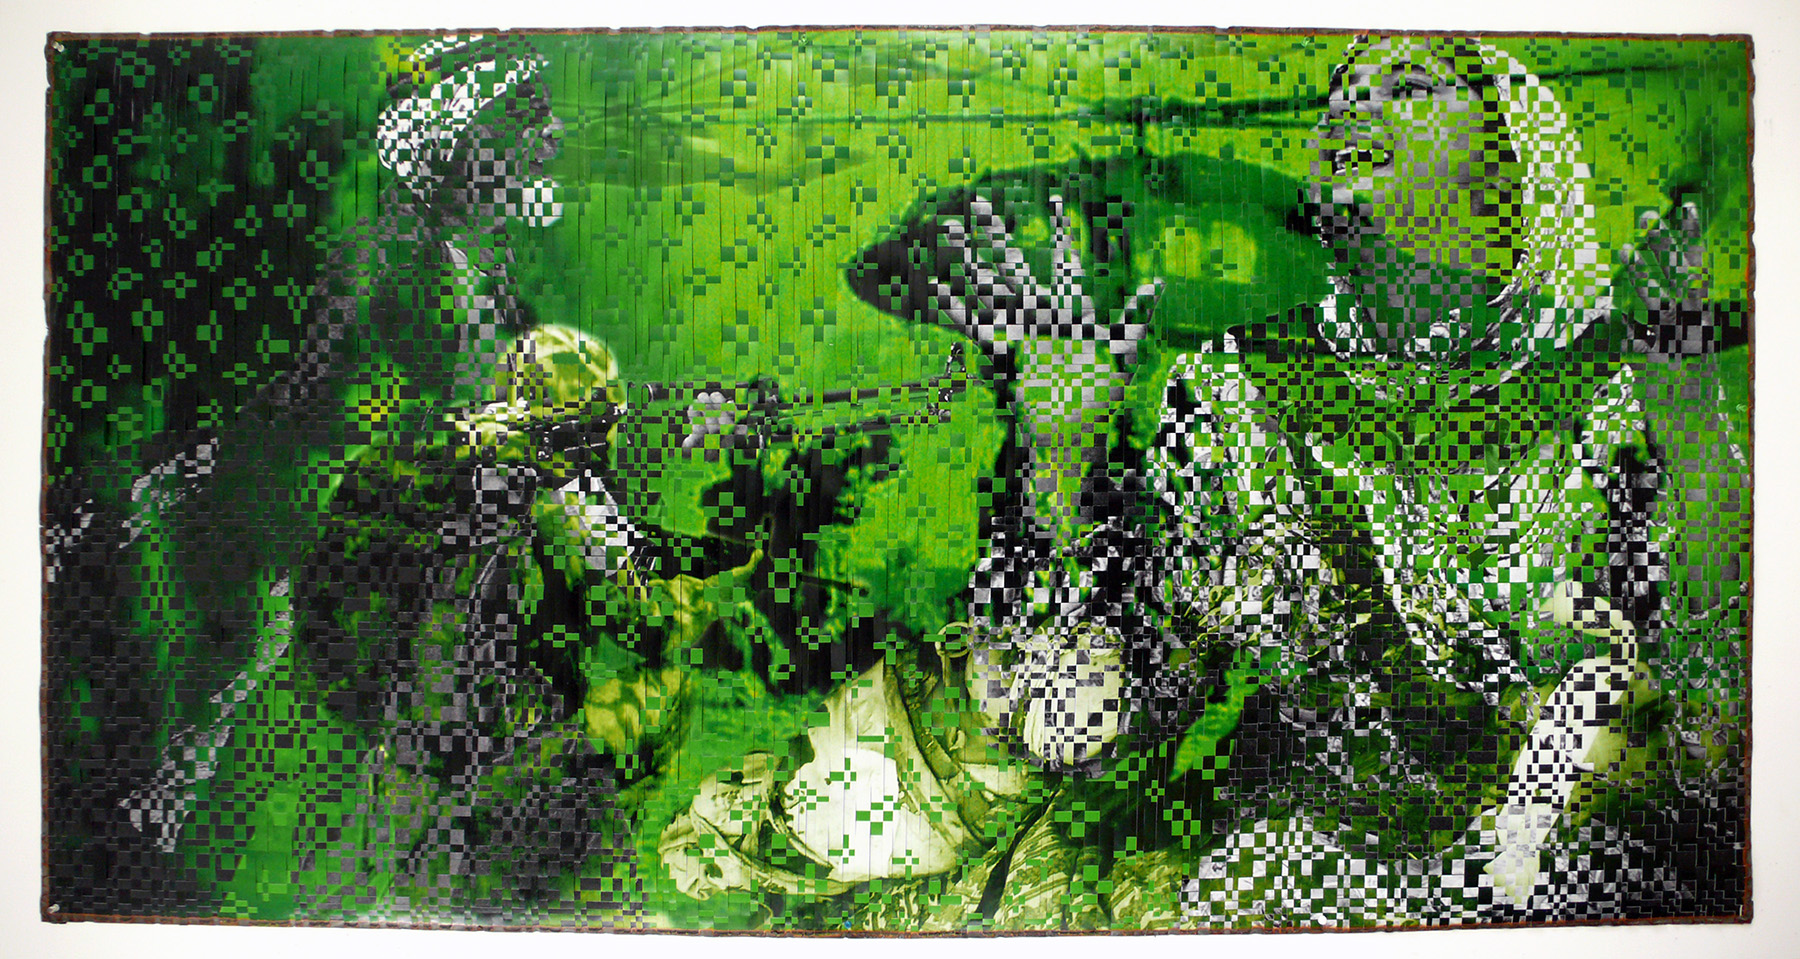 Artist: Dinh Q. Lê